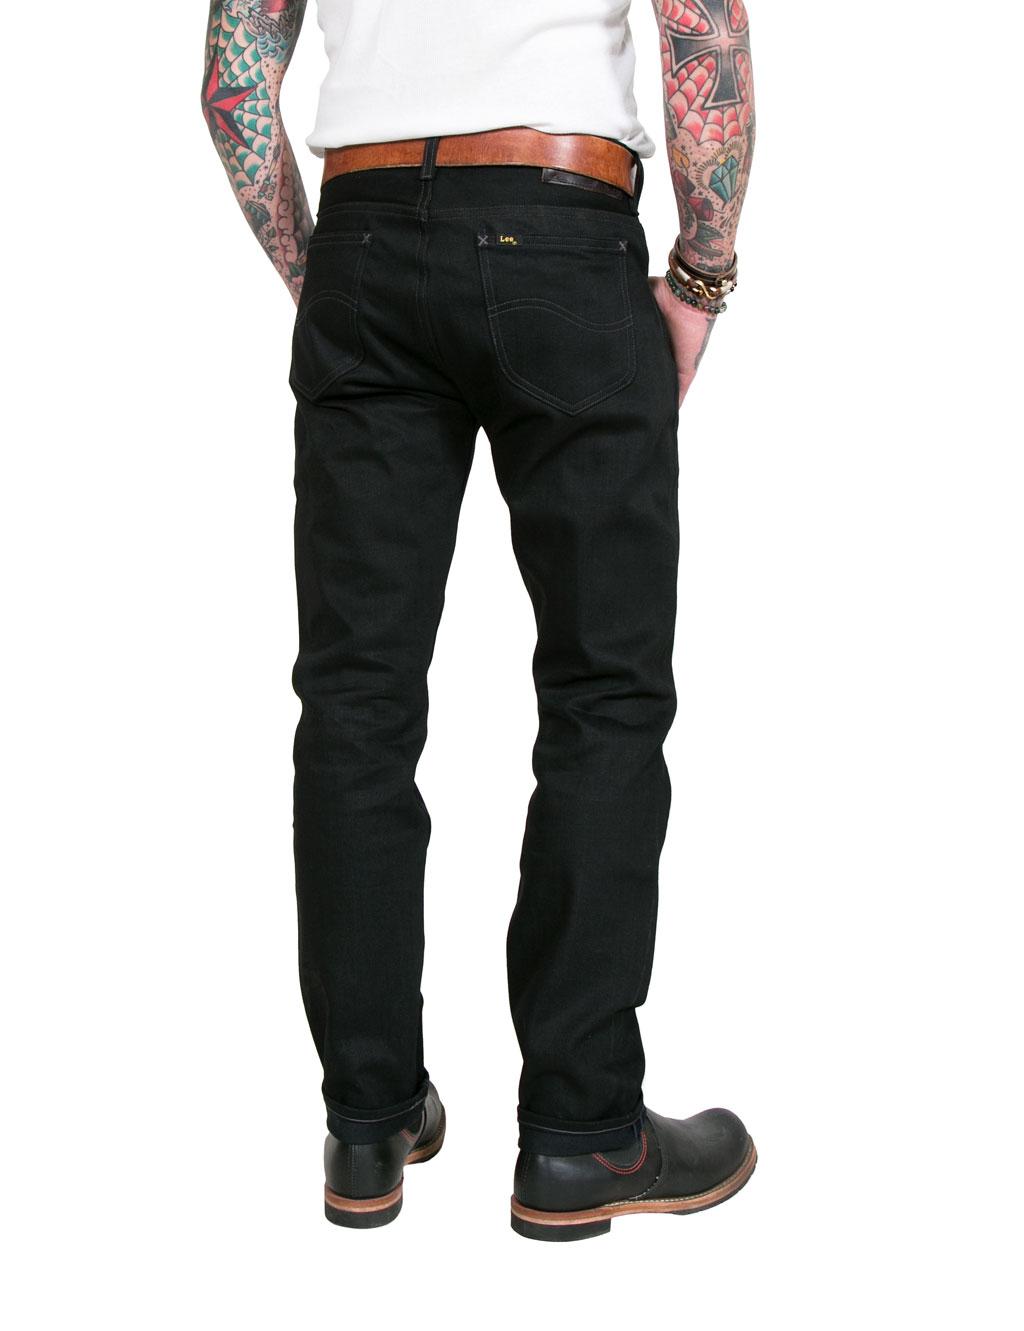 Black Black Black Jeans Slim Dry 13oz Rider Lee 101 101 101 101 Fit qRAYYw